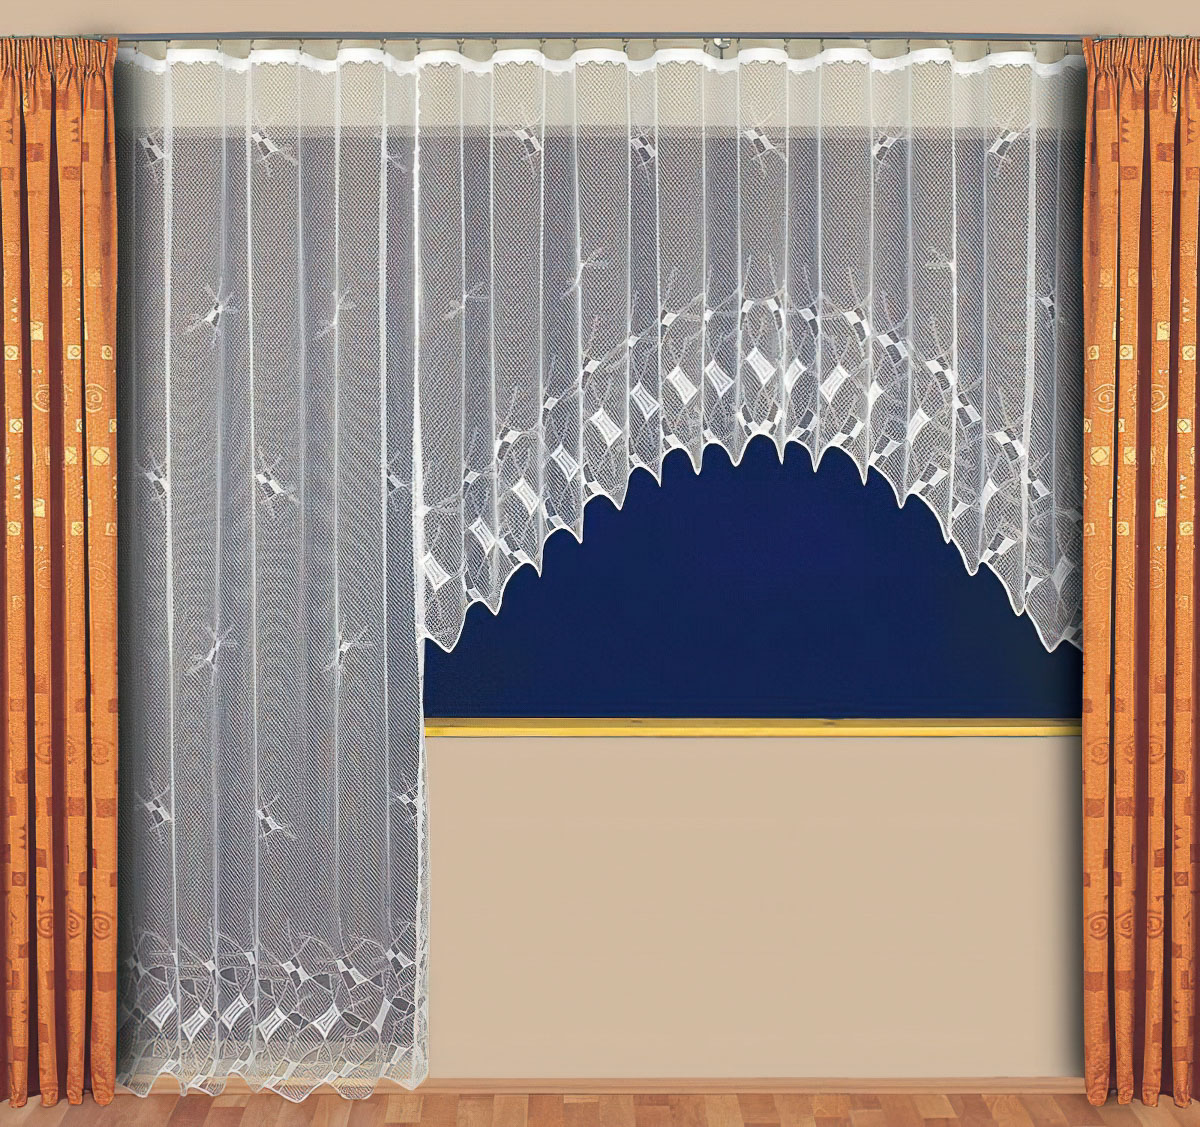 Tylex kusová záclona CALLISTO jednobarevná bílá, výška 250 cm x šířka 210 cm (na dveře)